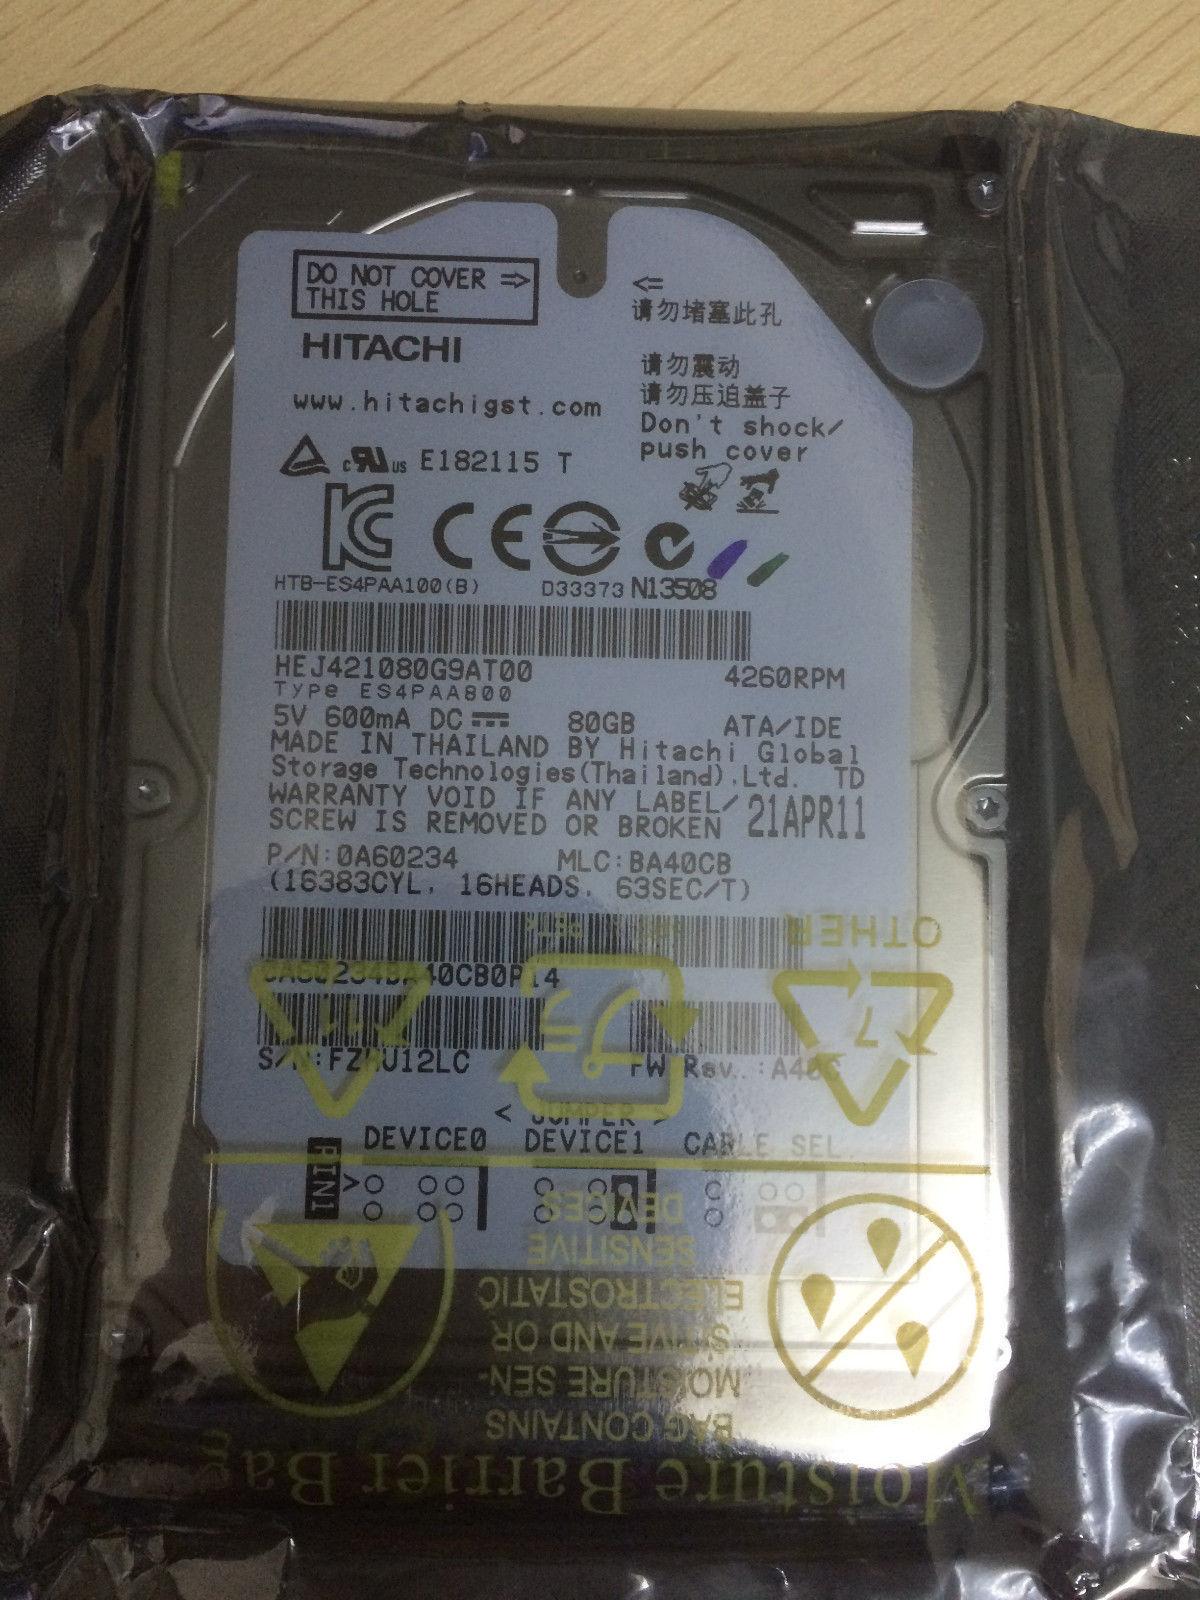 Hgst Endurastar J4k100 Hej421080g9at00 80gb And 46 Similar Items Hardisk Internal 25 120gb Toshiba Hitachi S L1600